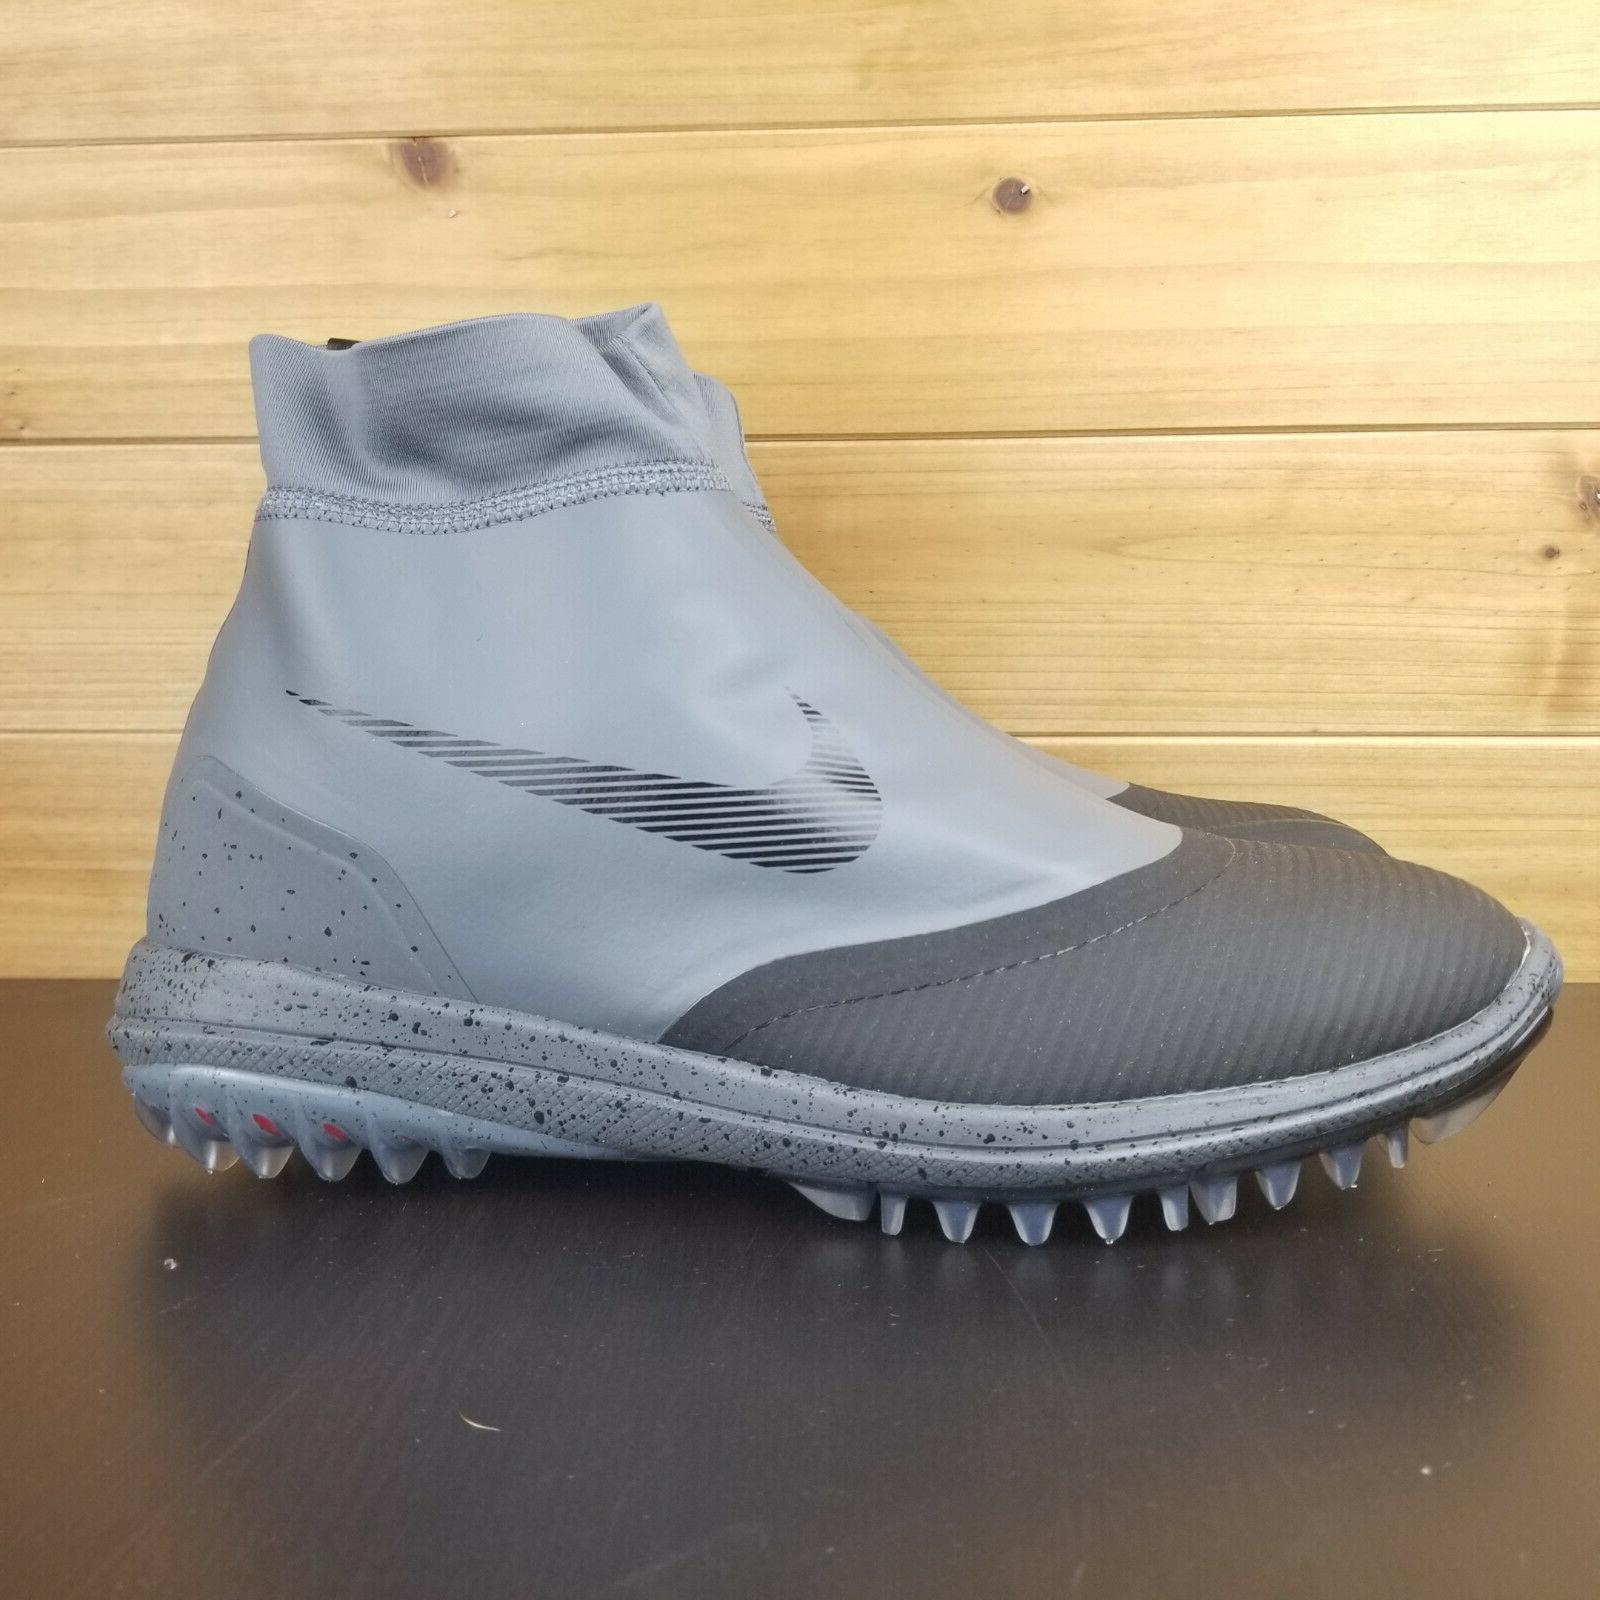 Nike Lunar Vaporstorm Shoes Gray Black Men's